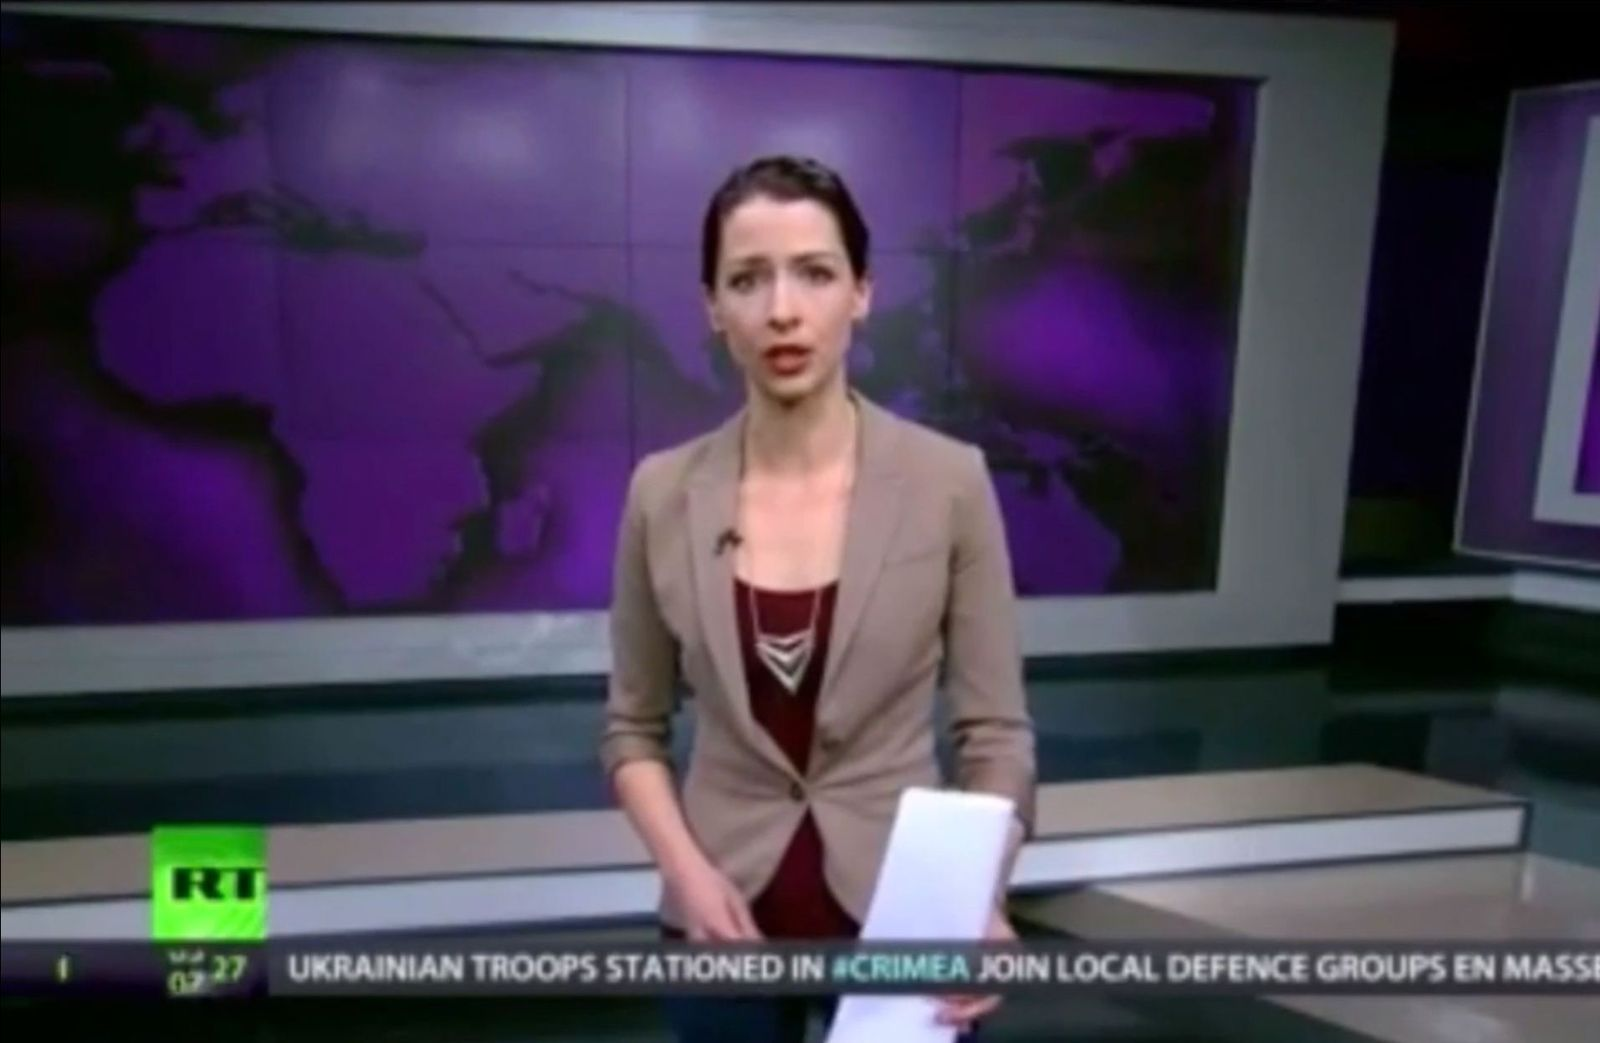 NUR ALS ZITAT Abby Martin / Russia Today USA